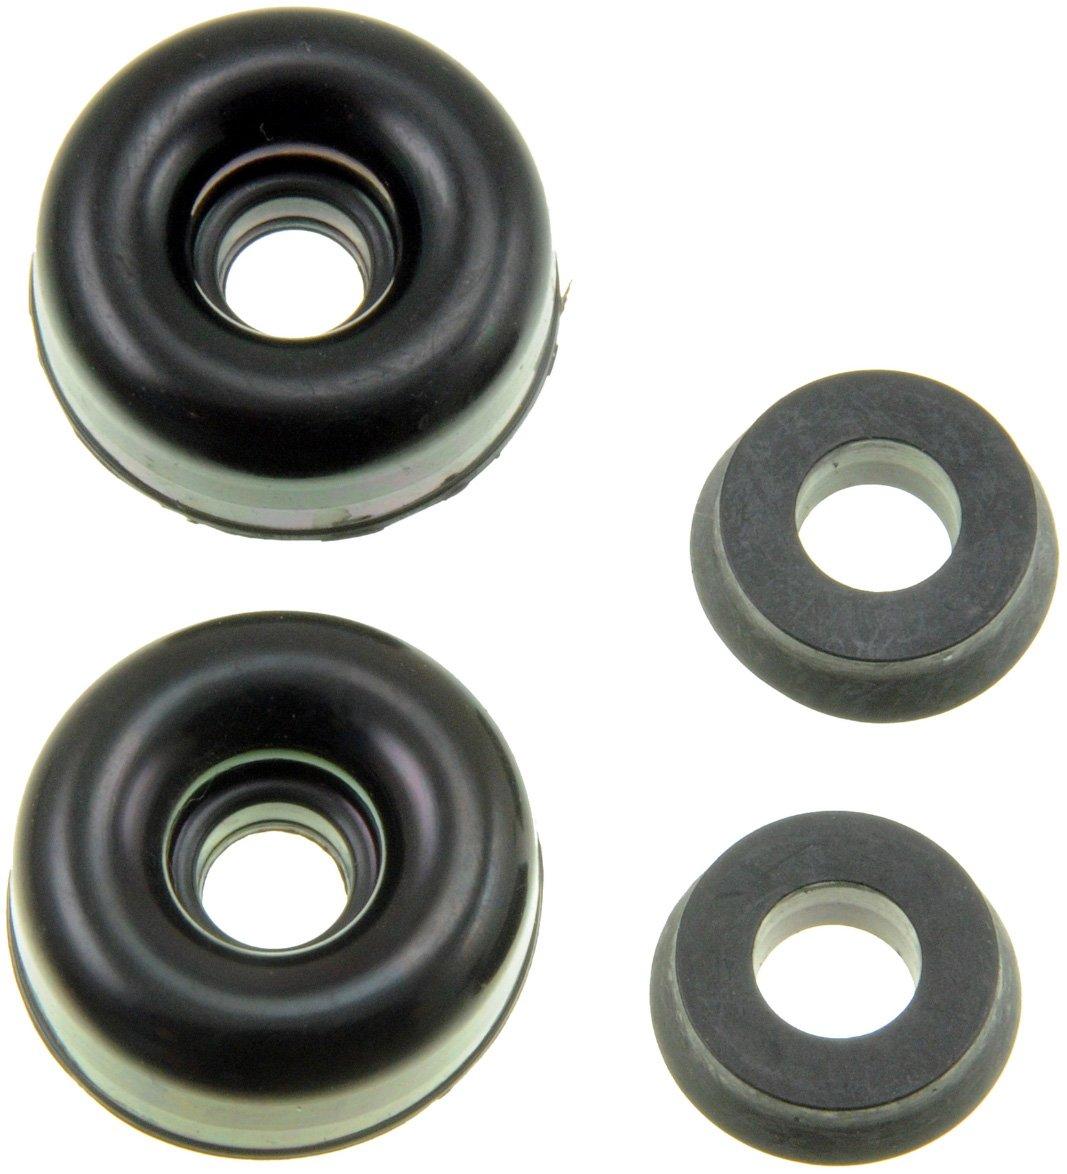 Dorman 351662 Drum Brake Wheel Cylinder Repair Kit Dorman - First Stop